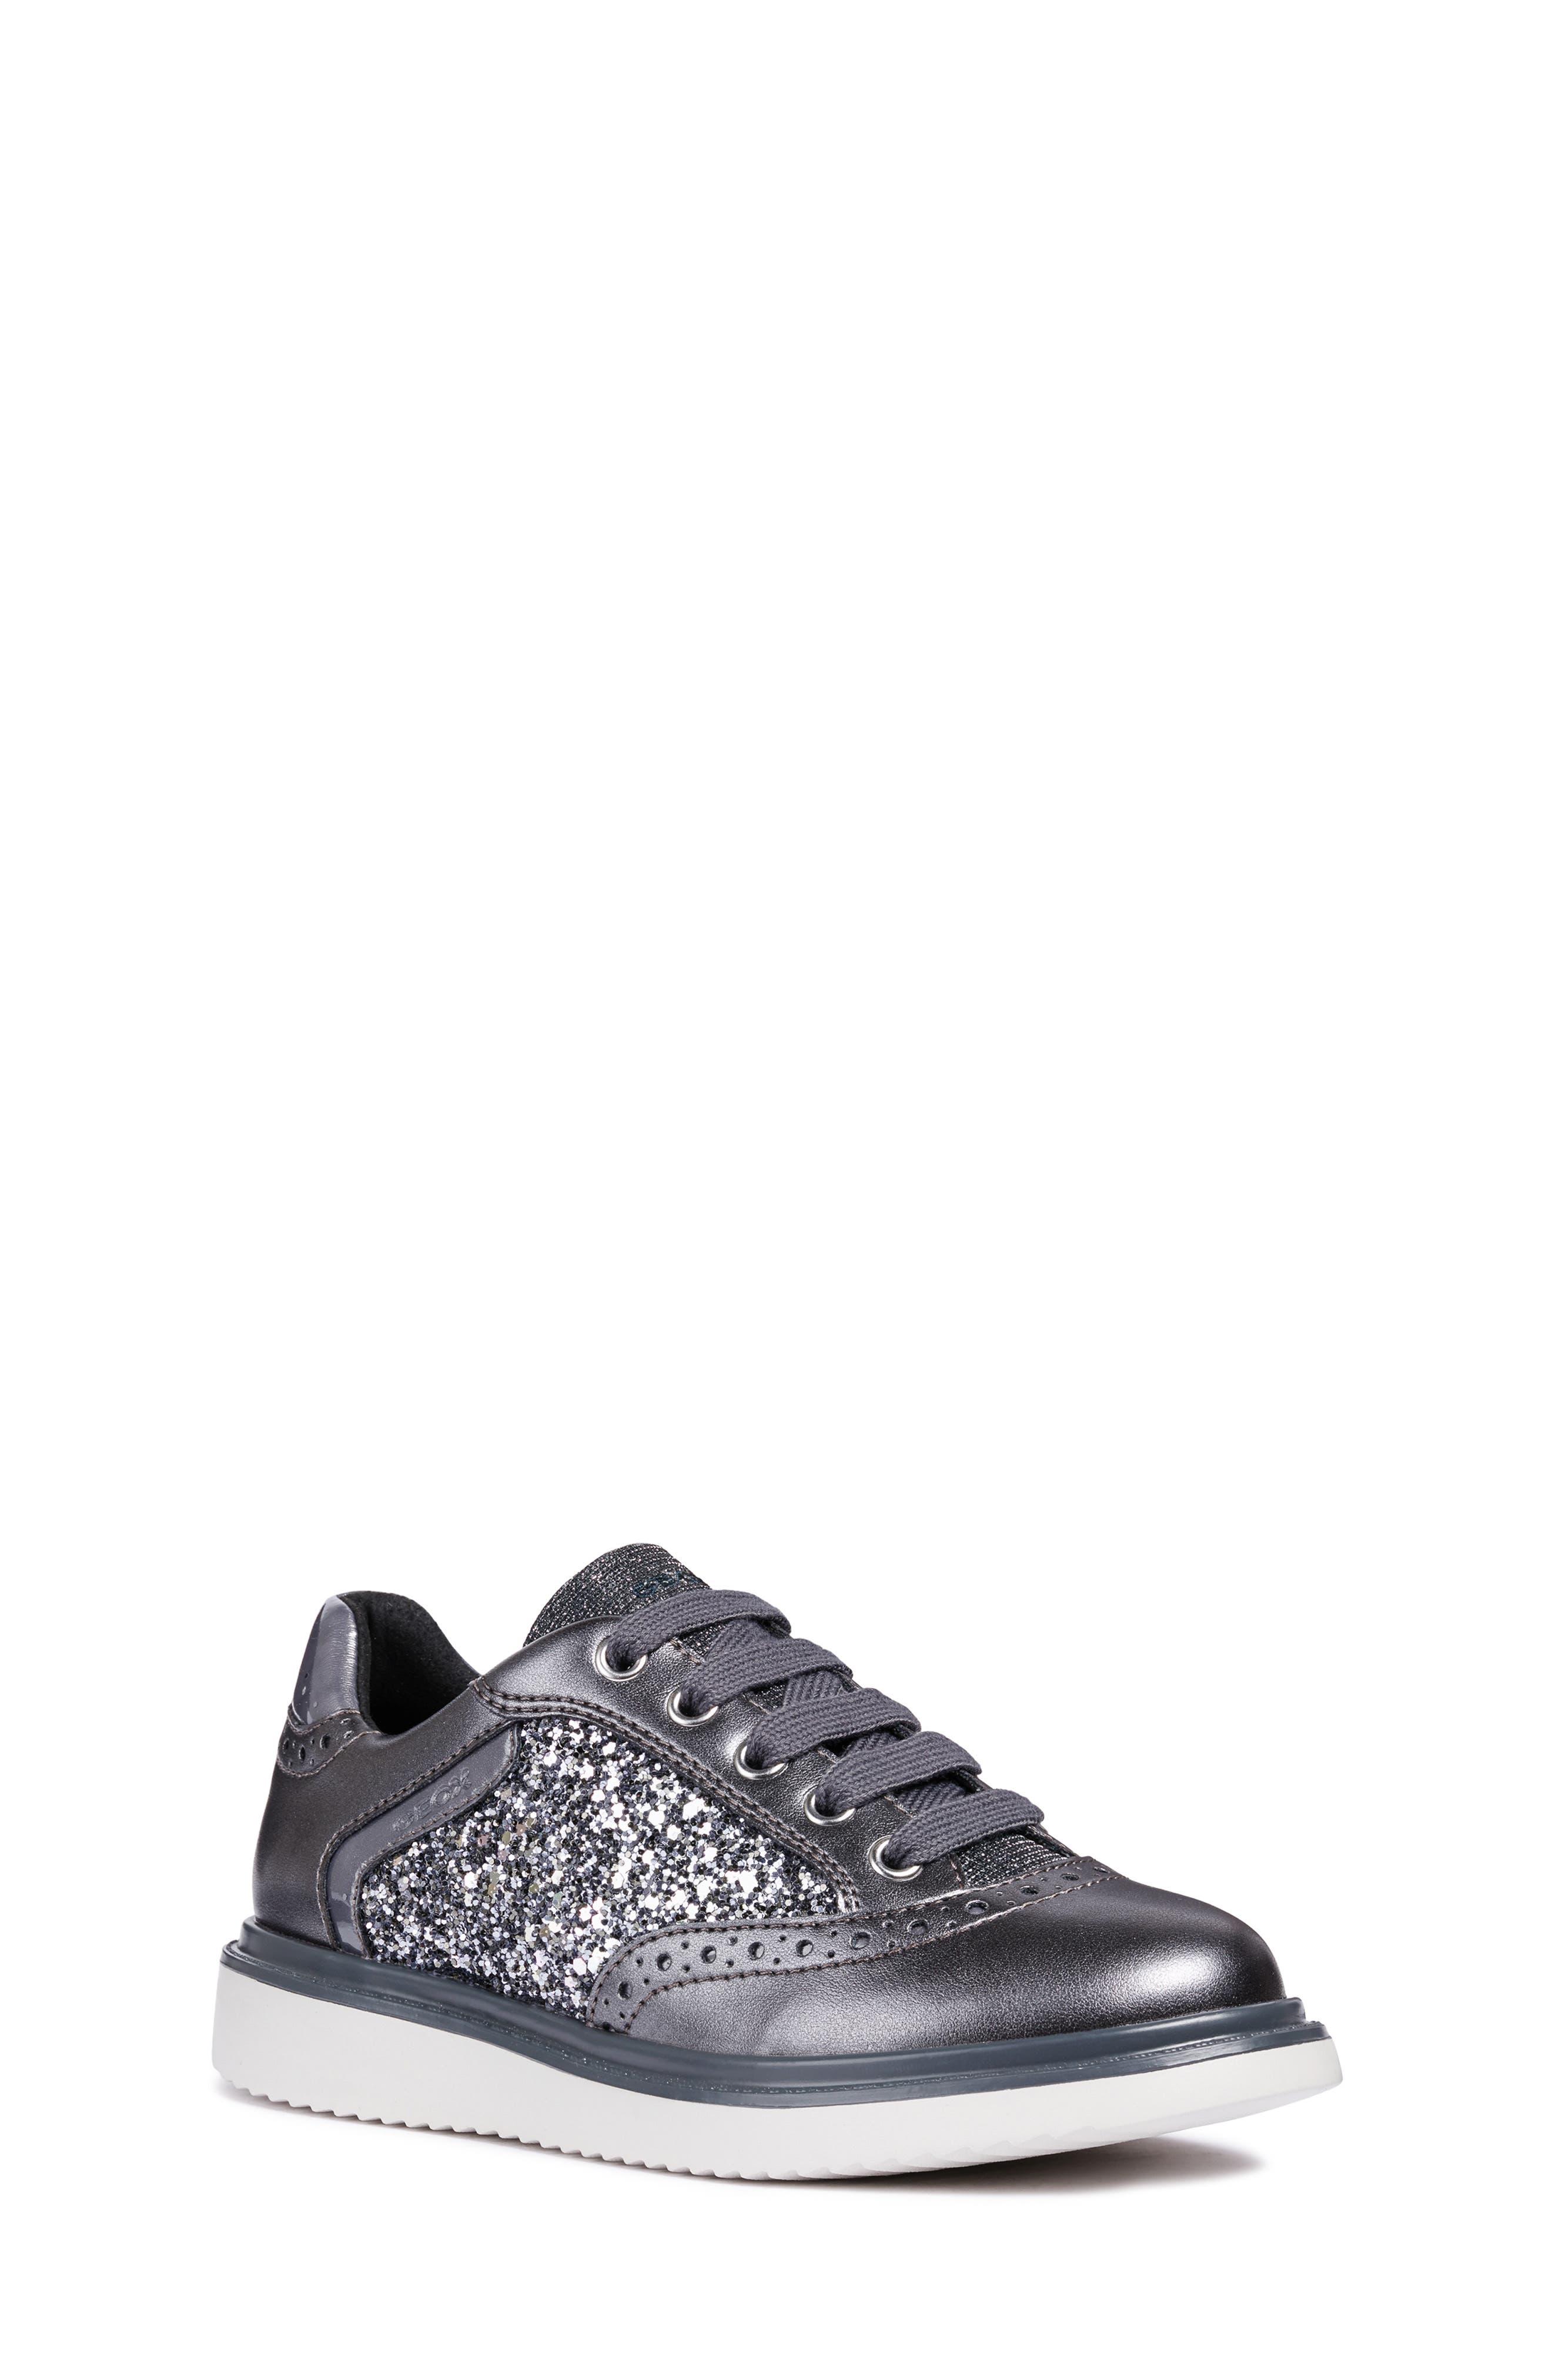 Thymar Sparkle Sneaker,                             Main thumbnail 1, color,                             DARK SILVER